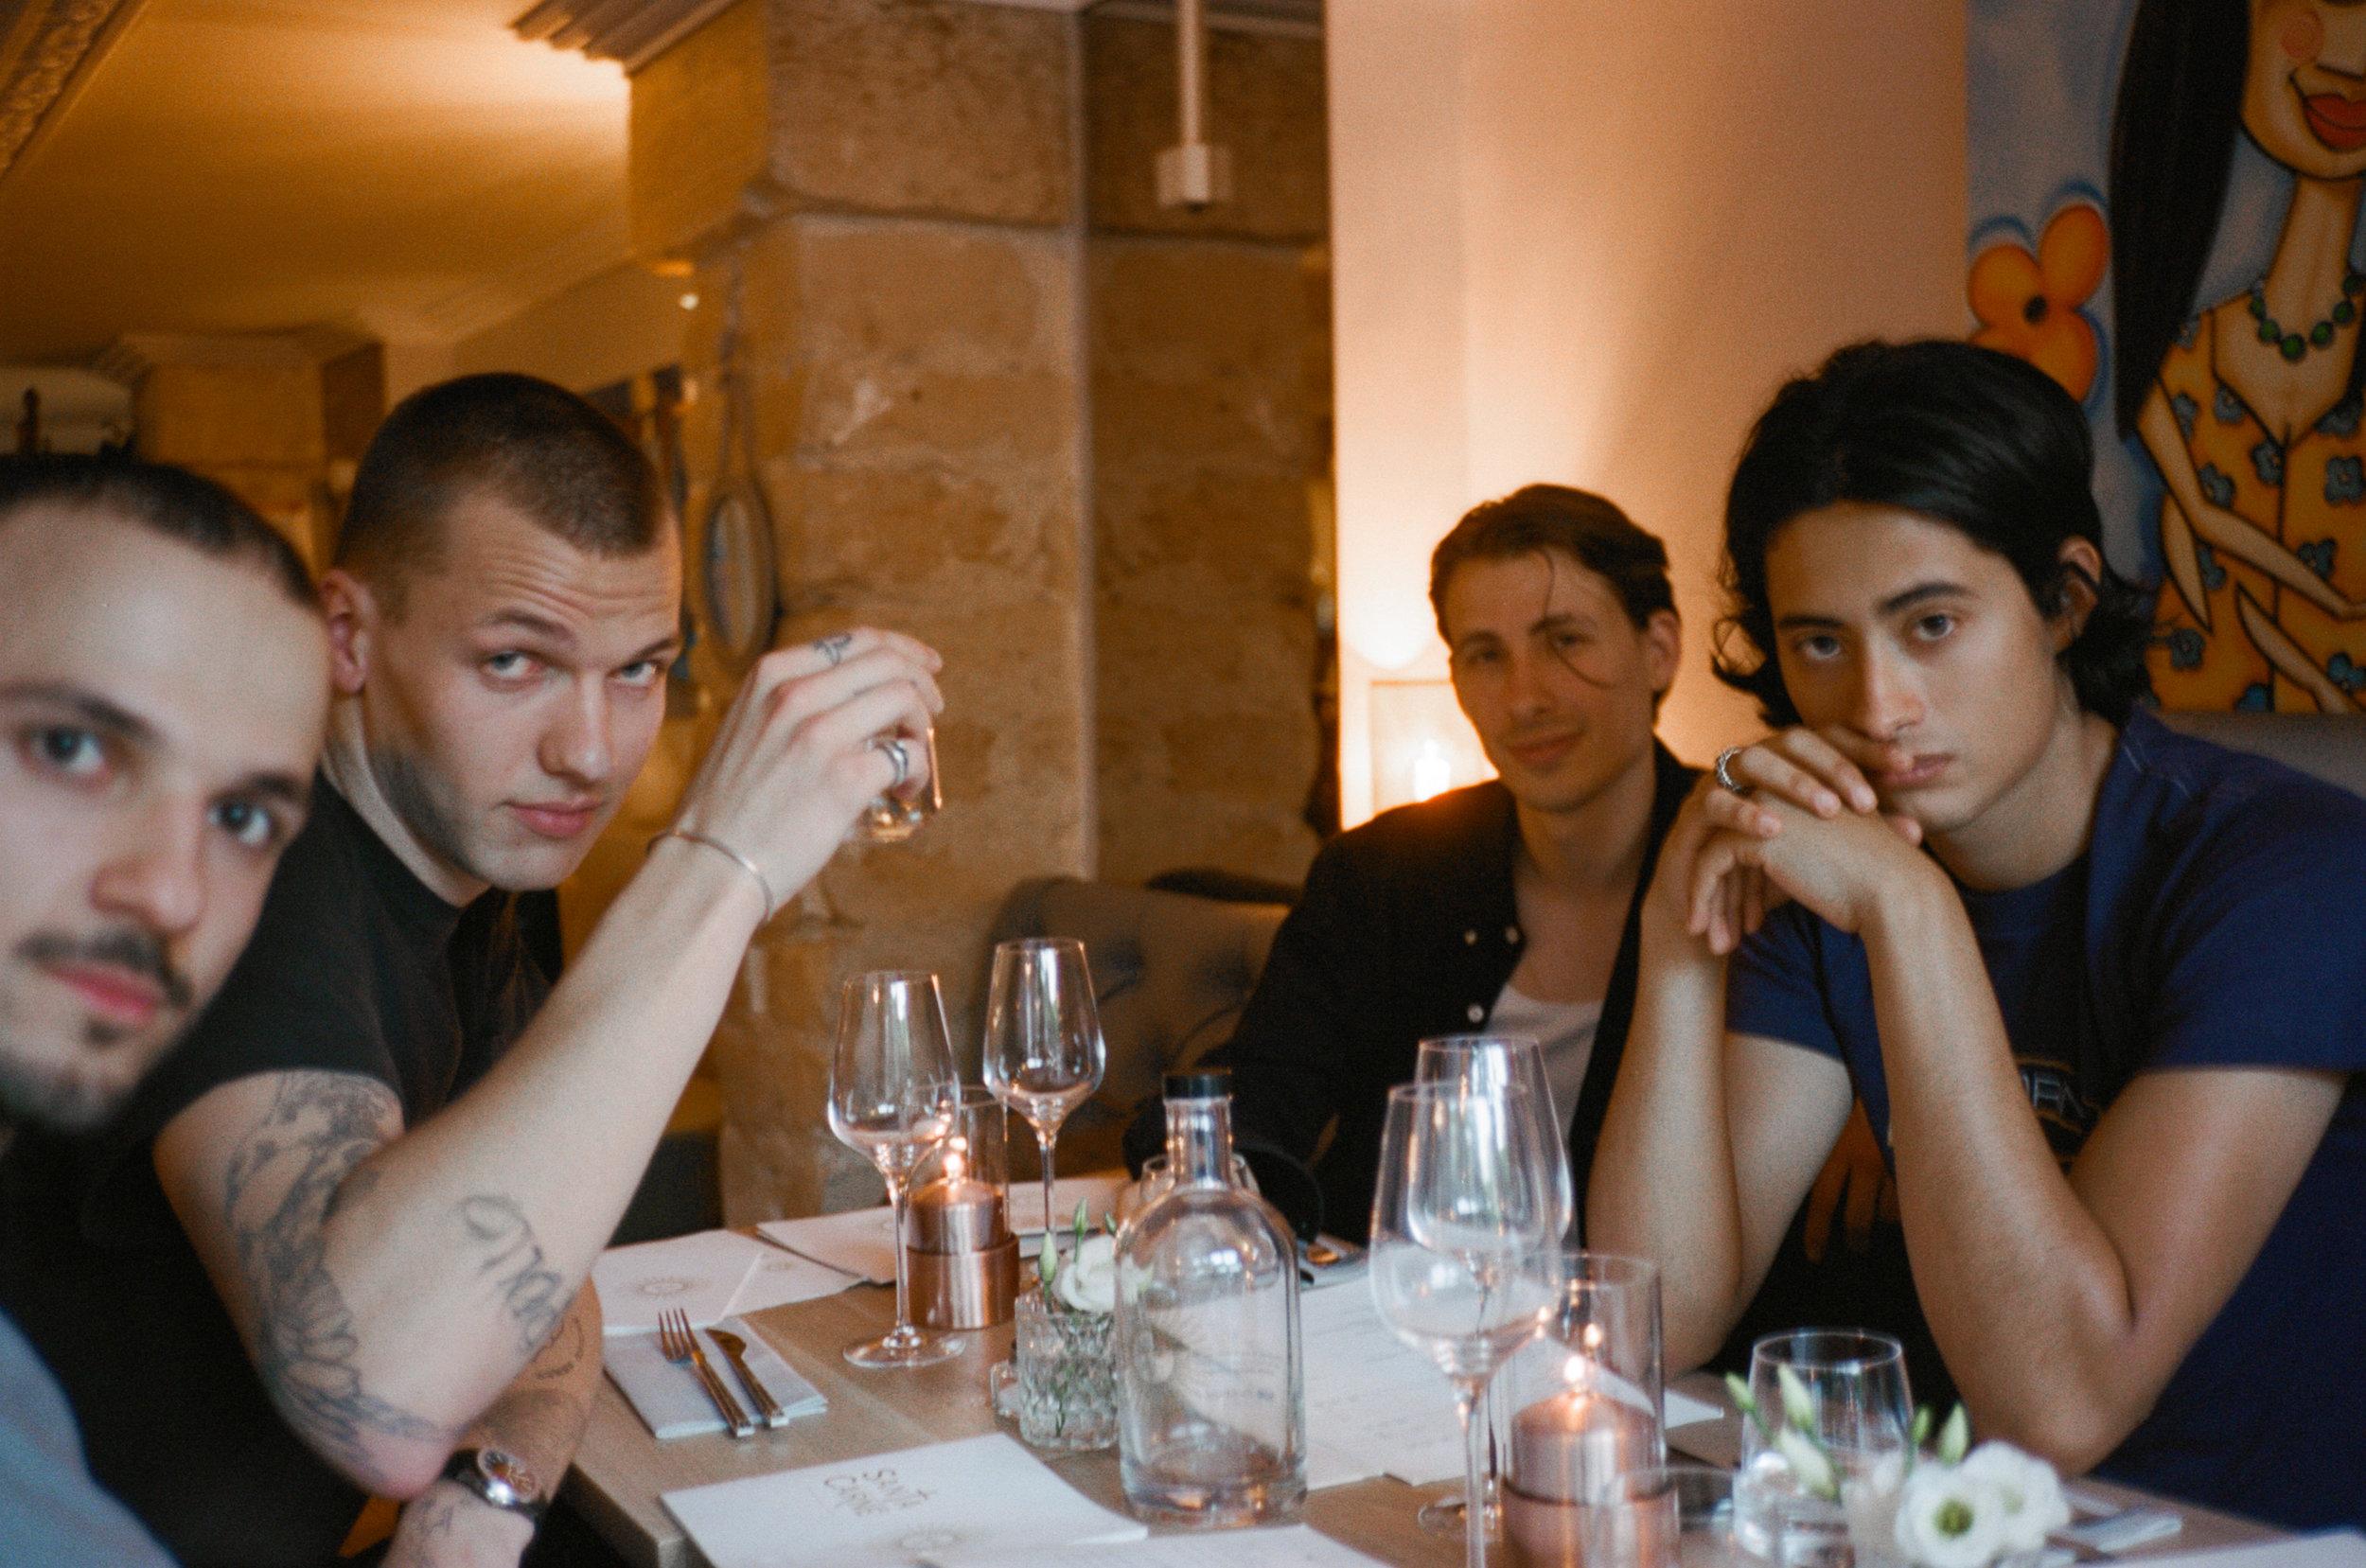 Night 1 friends dinner. Mehmet Çevik Jakob Hetzer Illya Goldman Alberto Mier